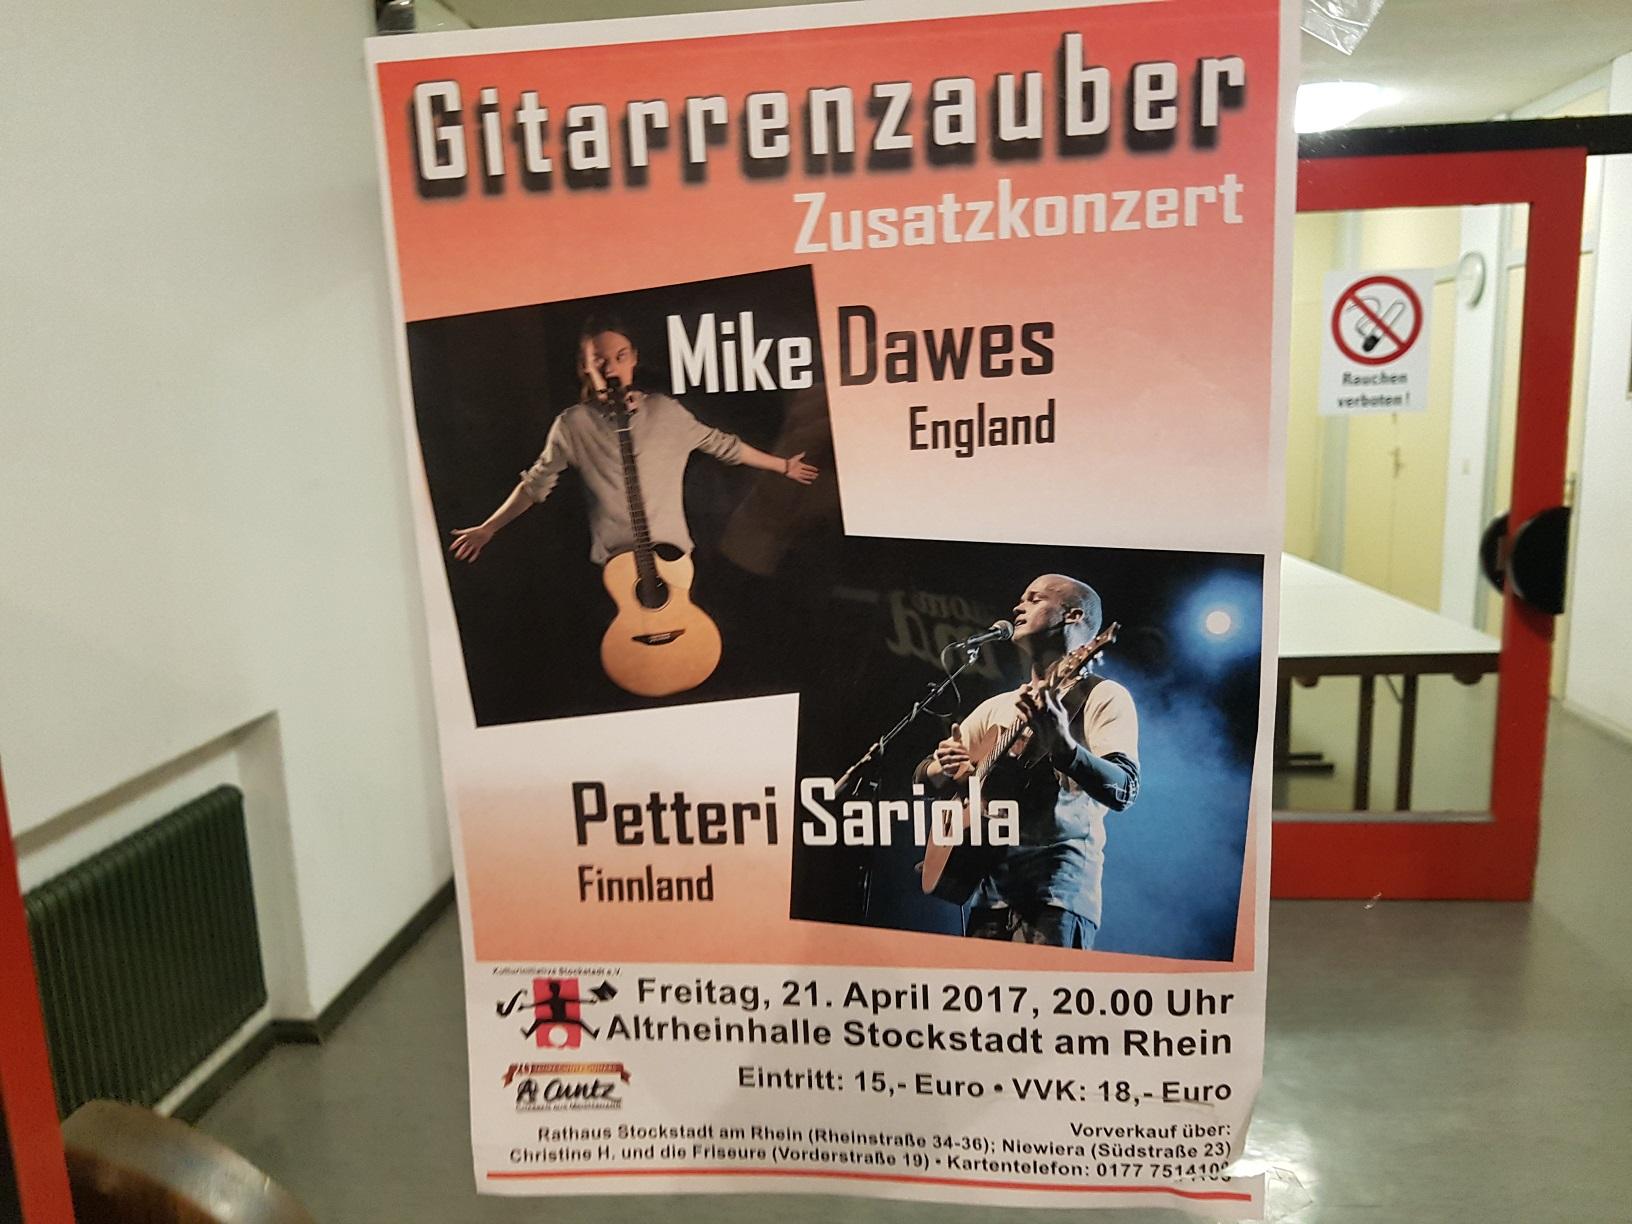 Mike Dawes und Petteri Sariola